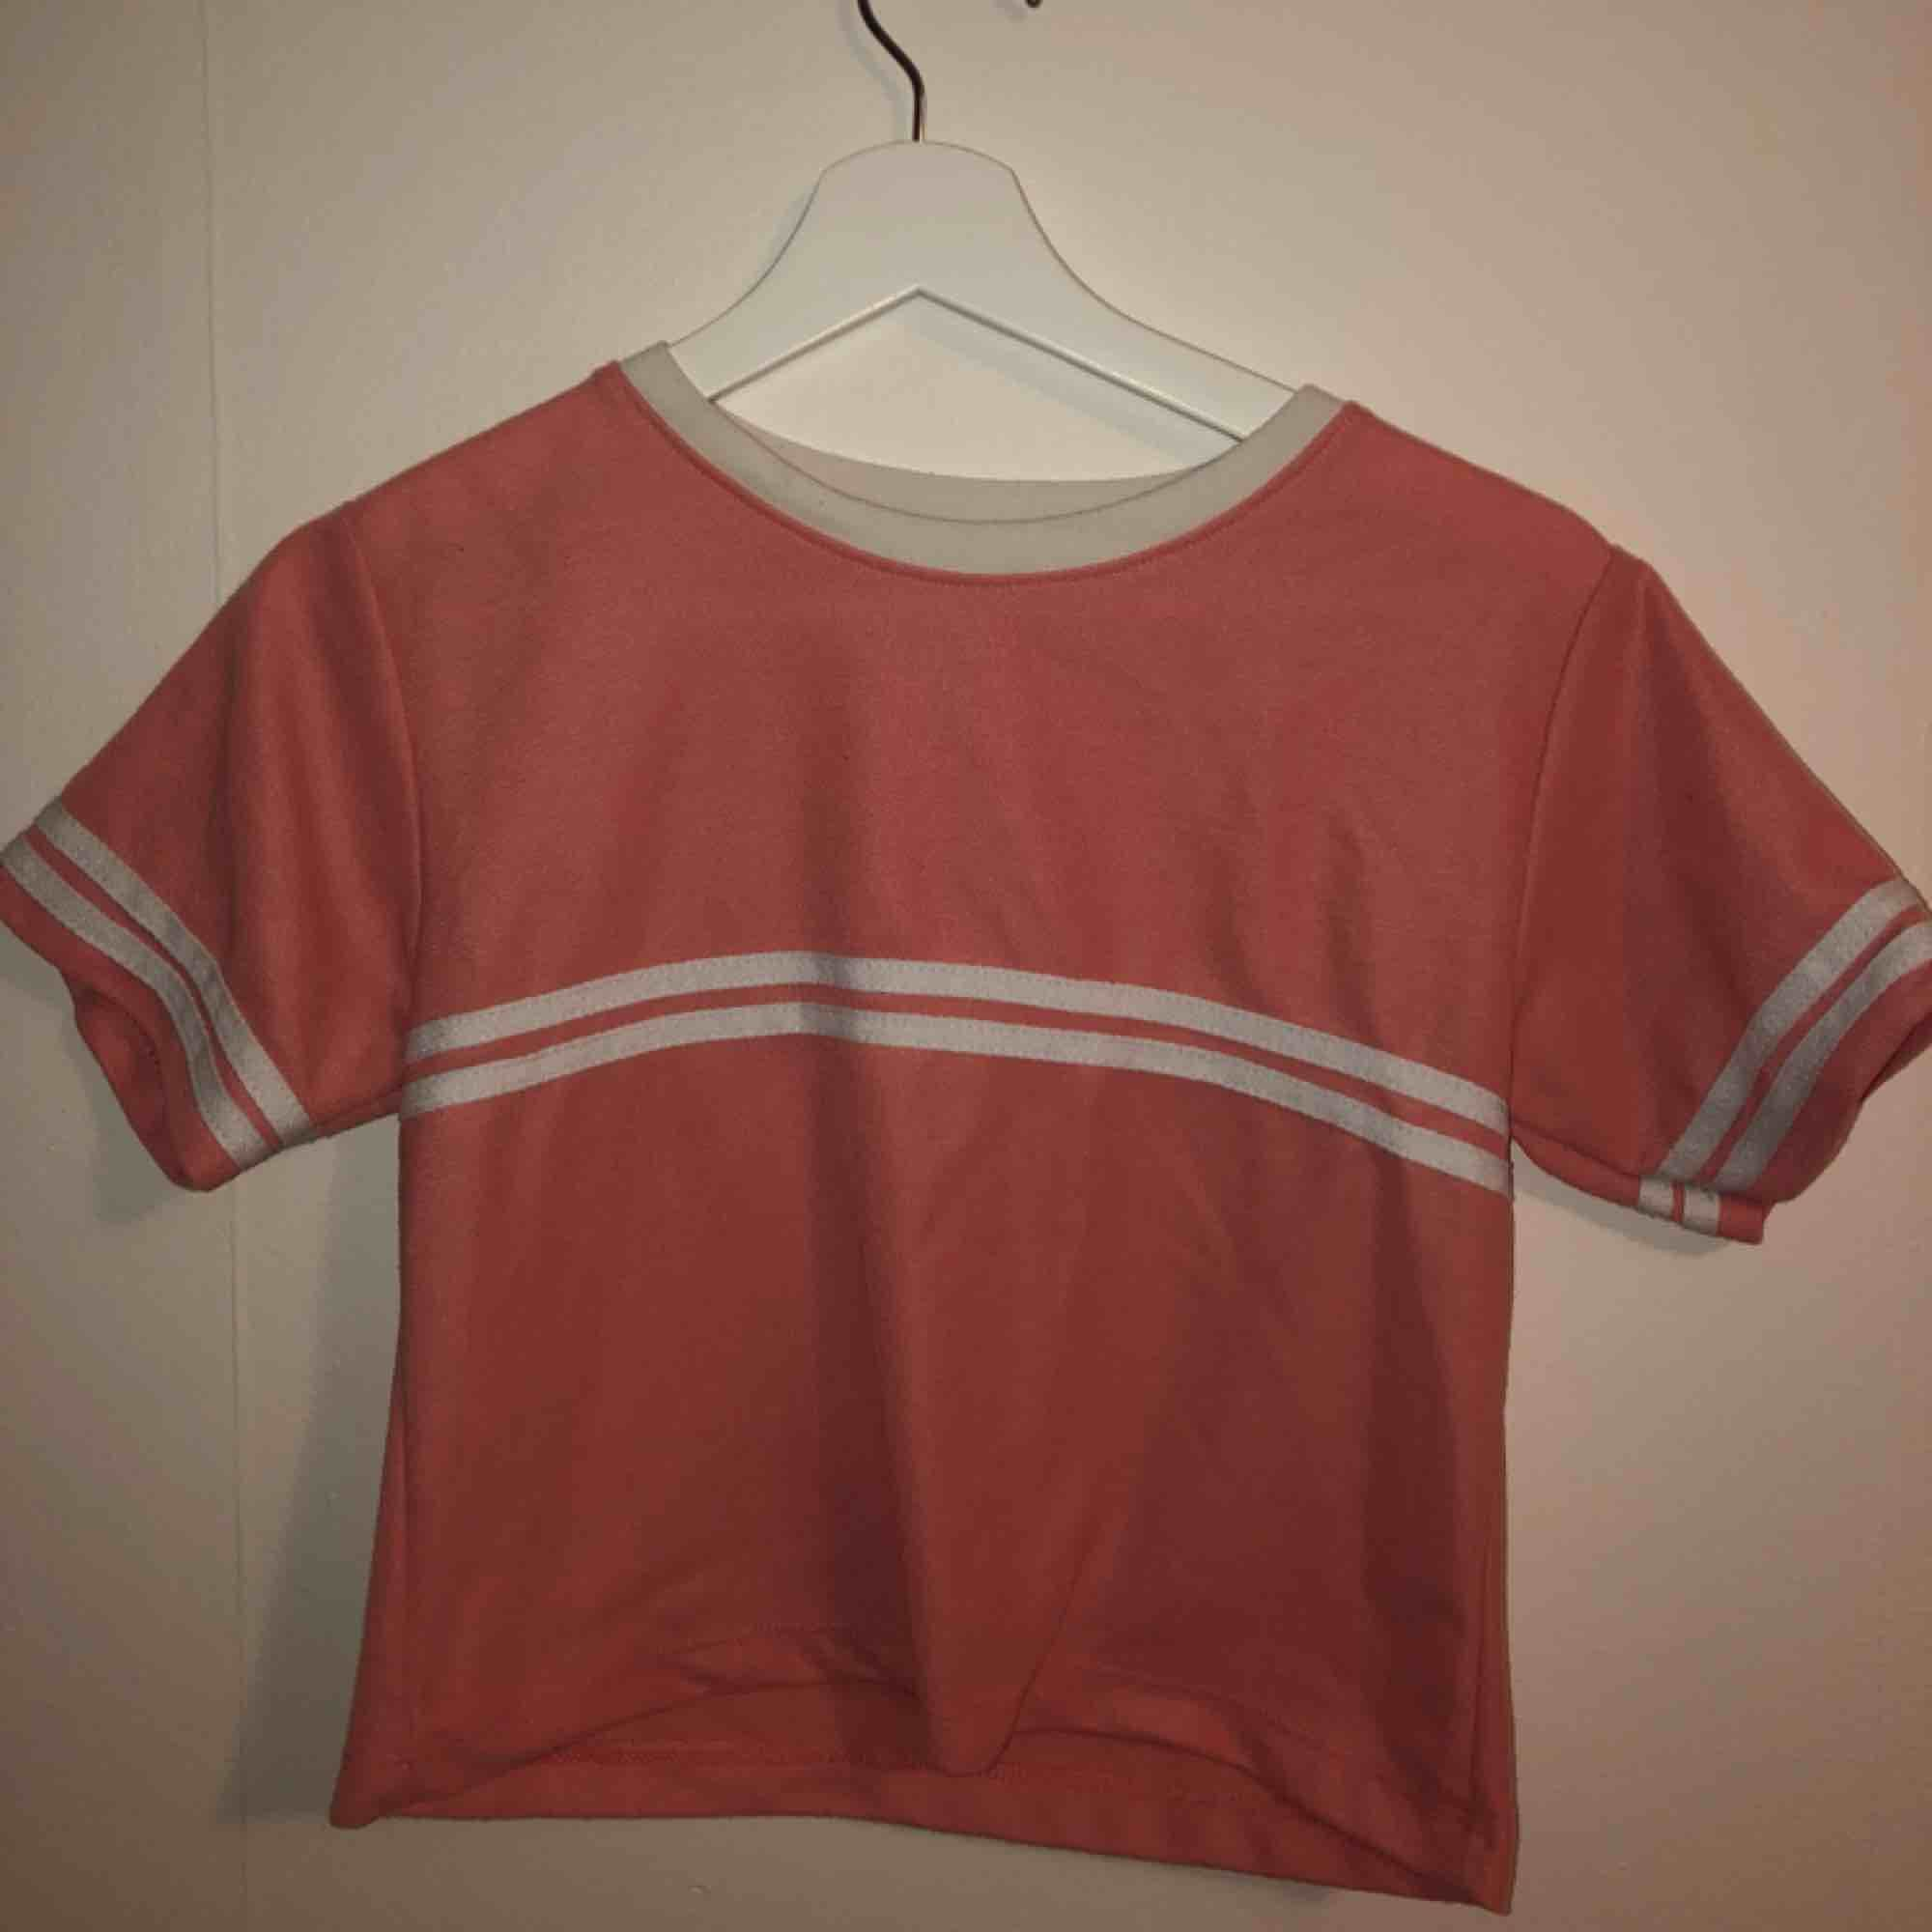 Fin t-shirt i korallrosa färg.. T-shirts.